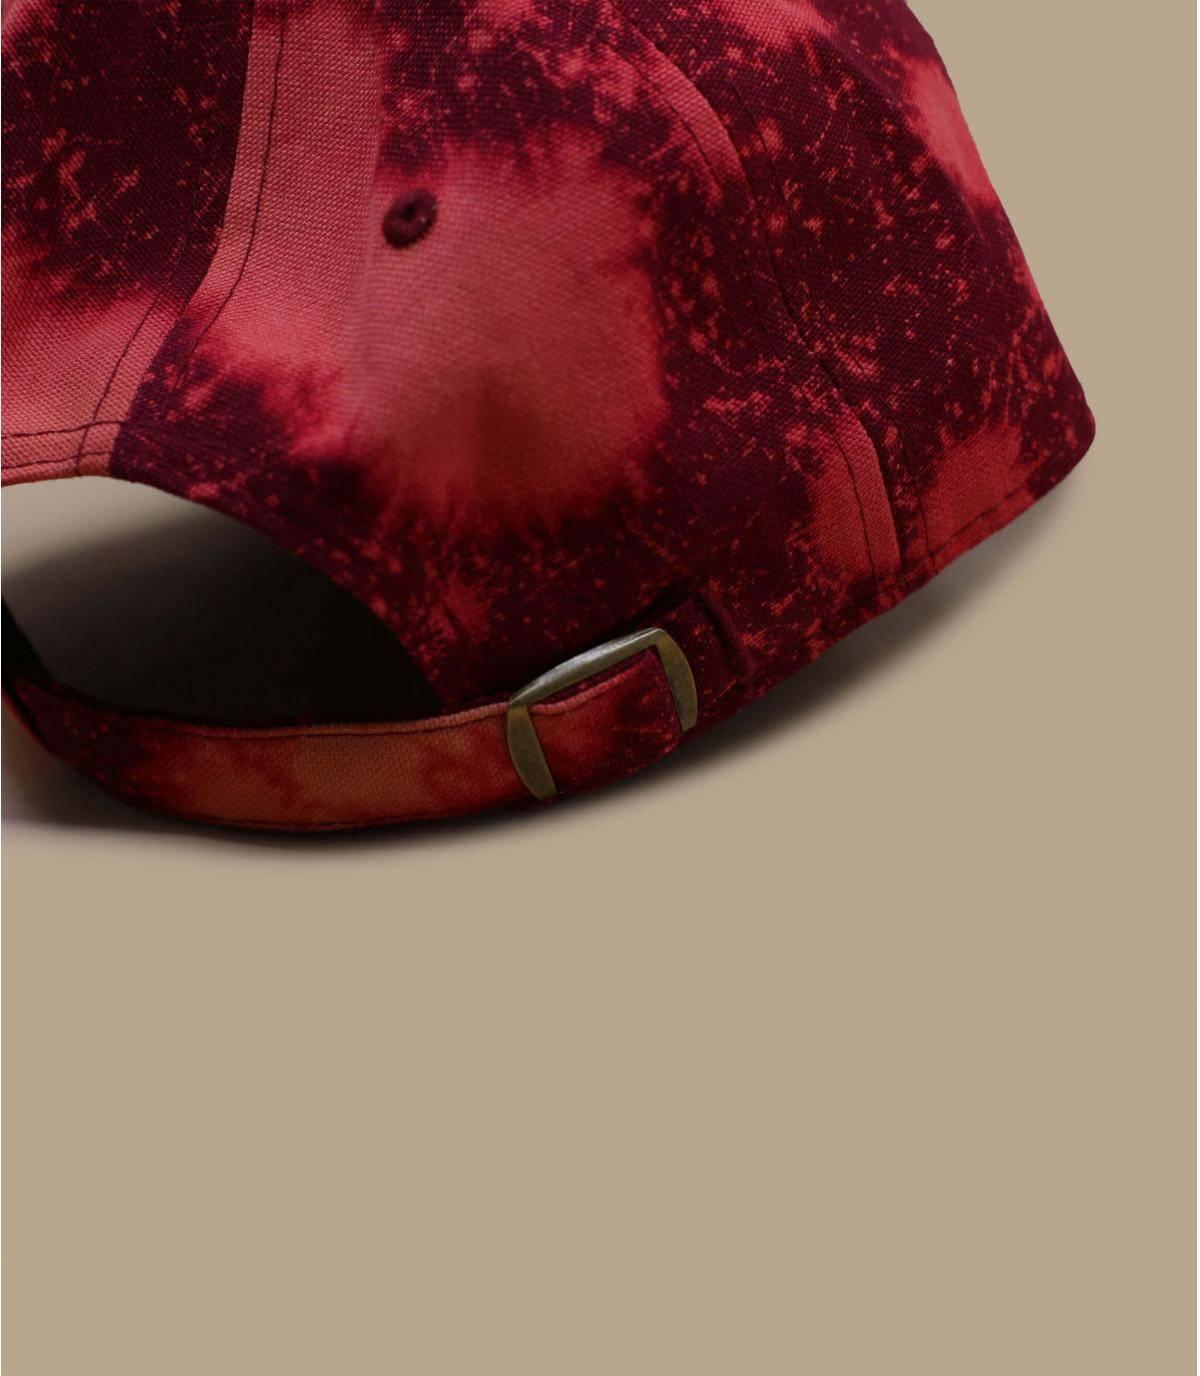 Details Wash Canvas CSCL 920 NY hot red - Abbildung 4